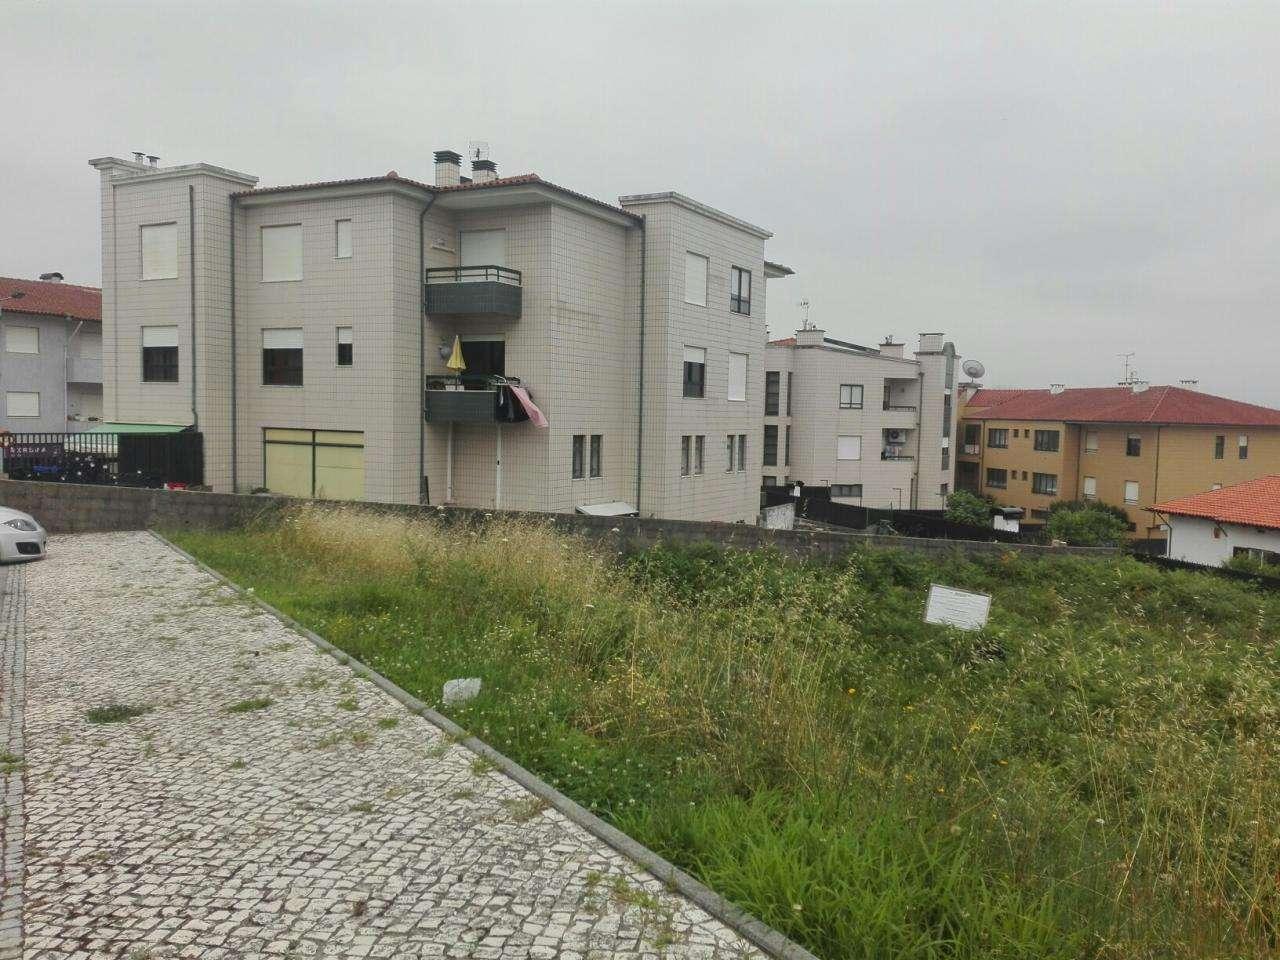 Terreno para comprar, Vila de Cucujães, Aveiro - Foto 2